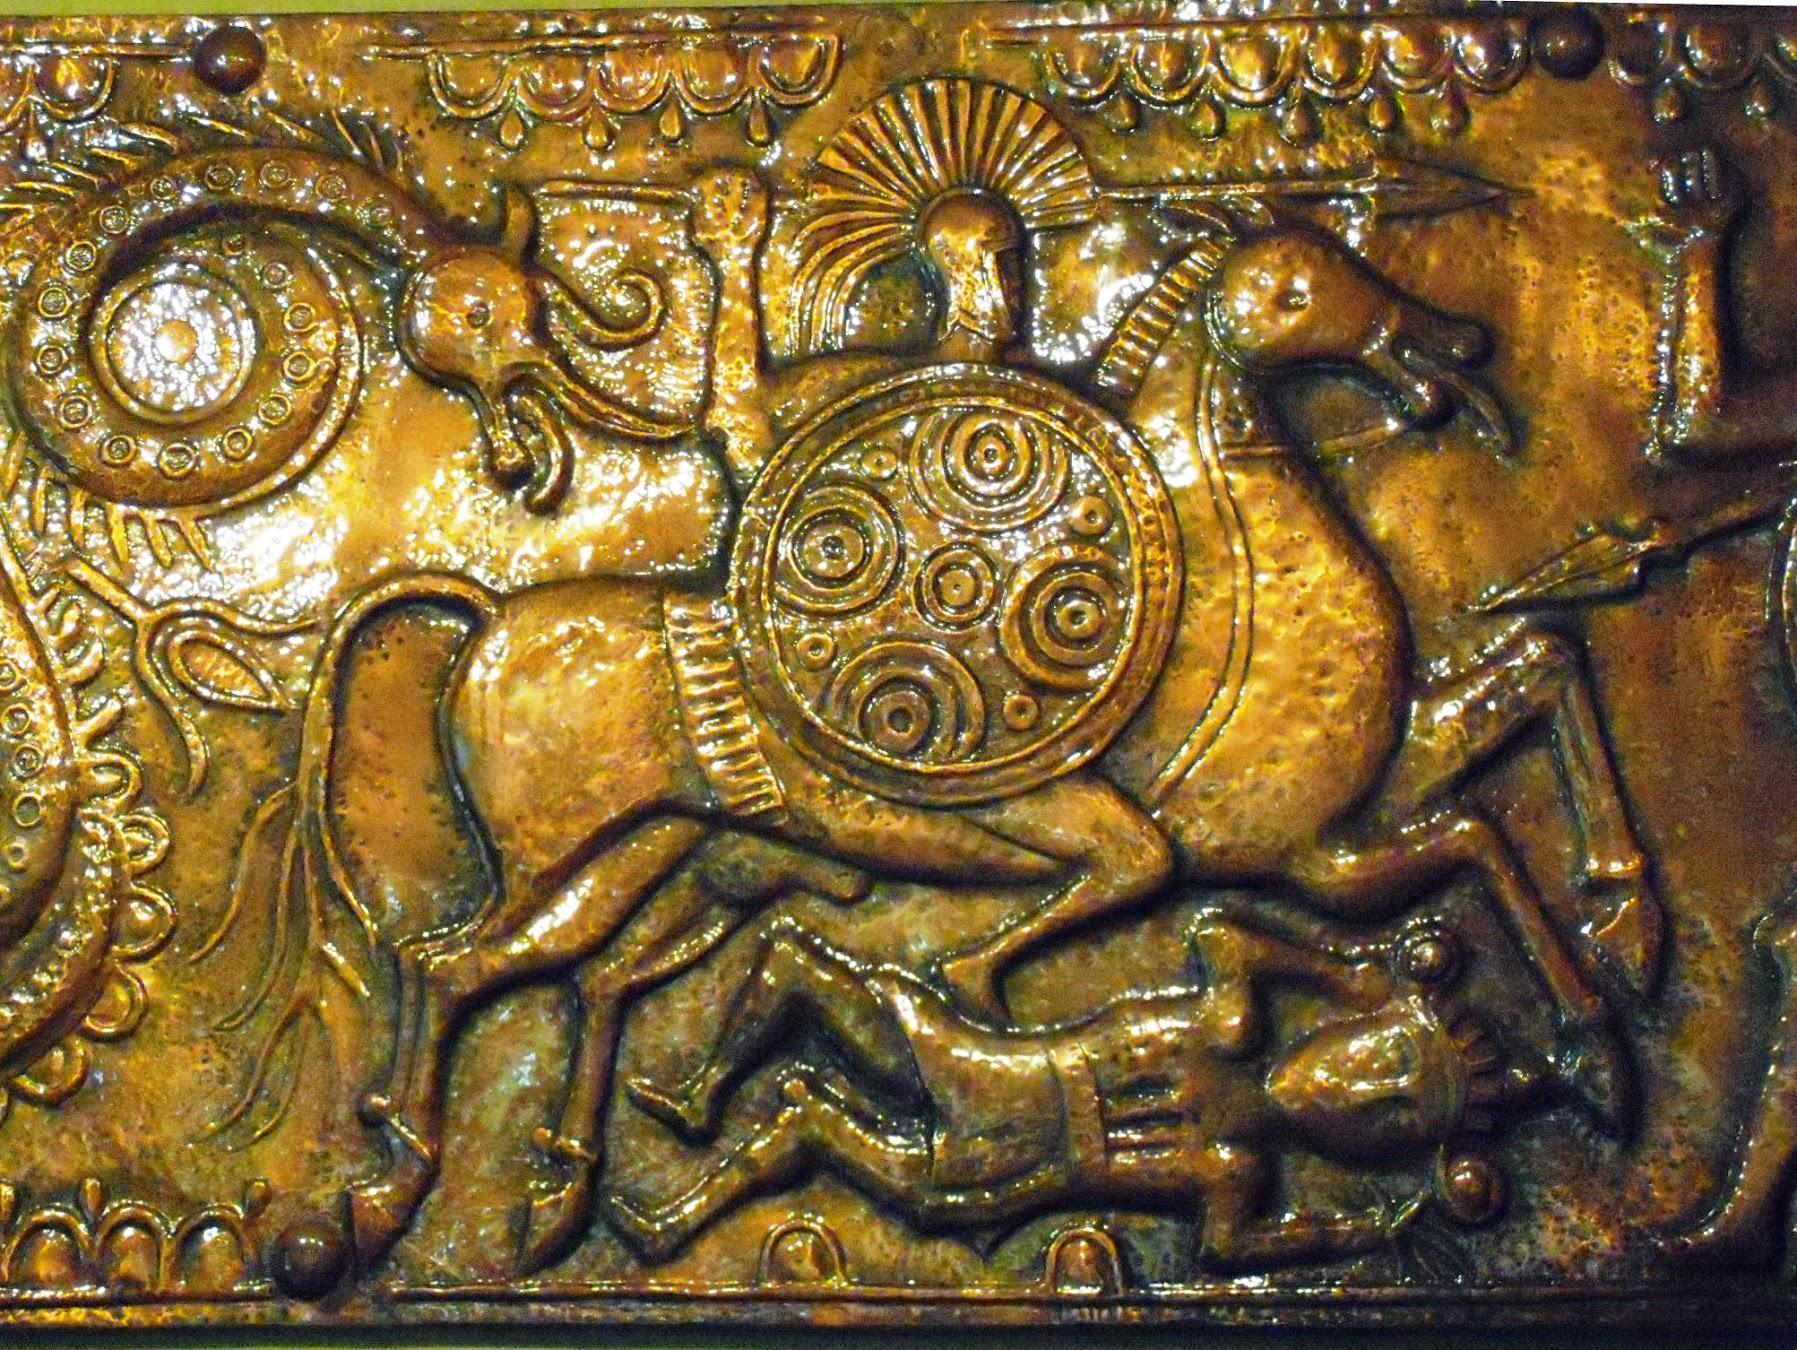 Illyrian belt buckle from Selca c230 BC, Mus Tirana